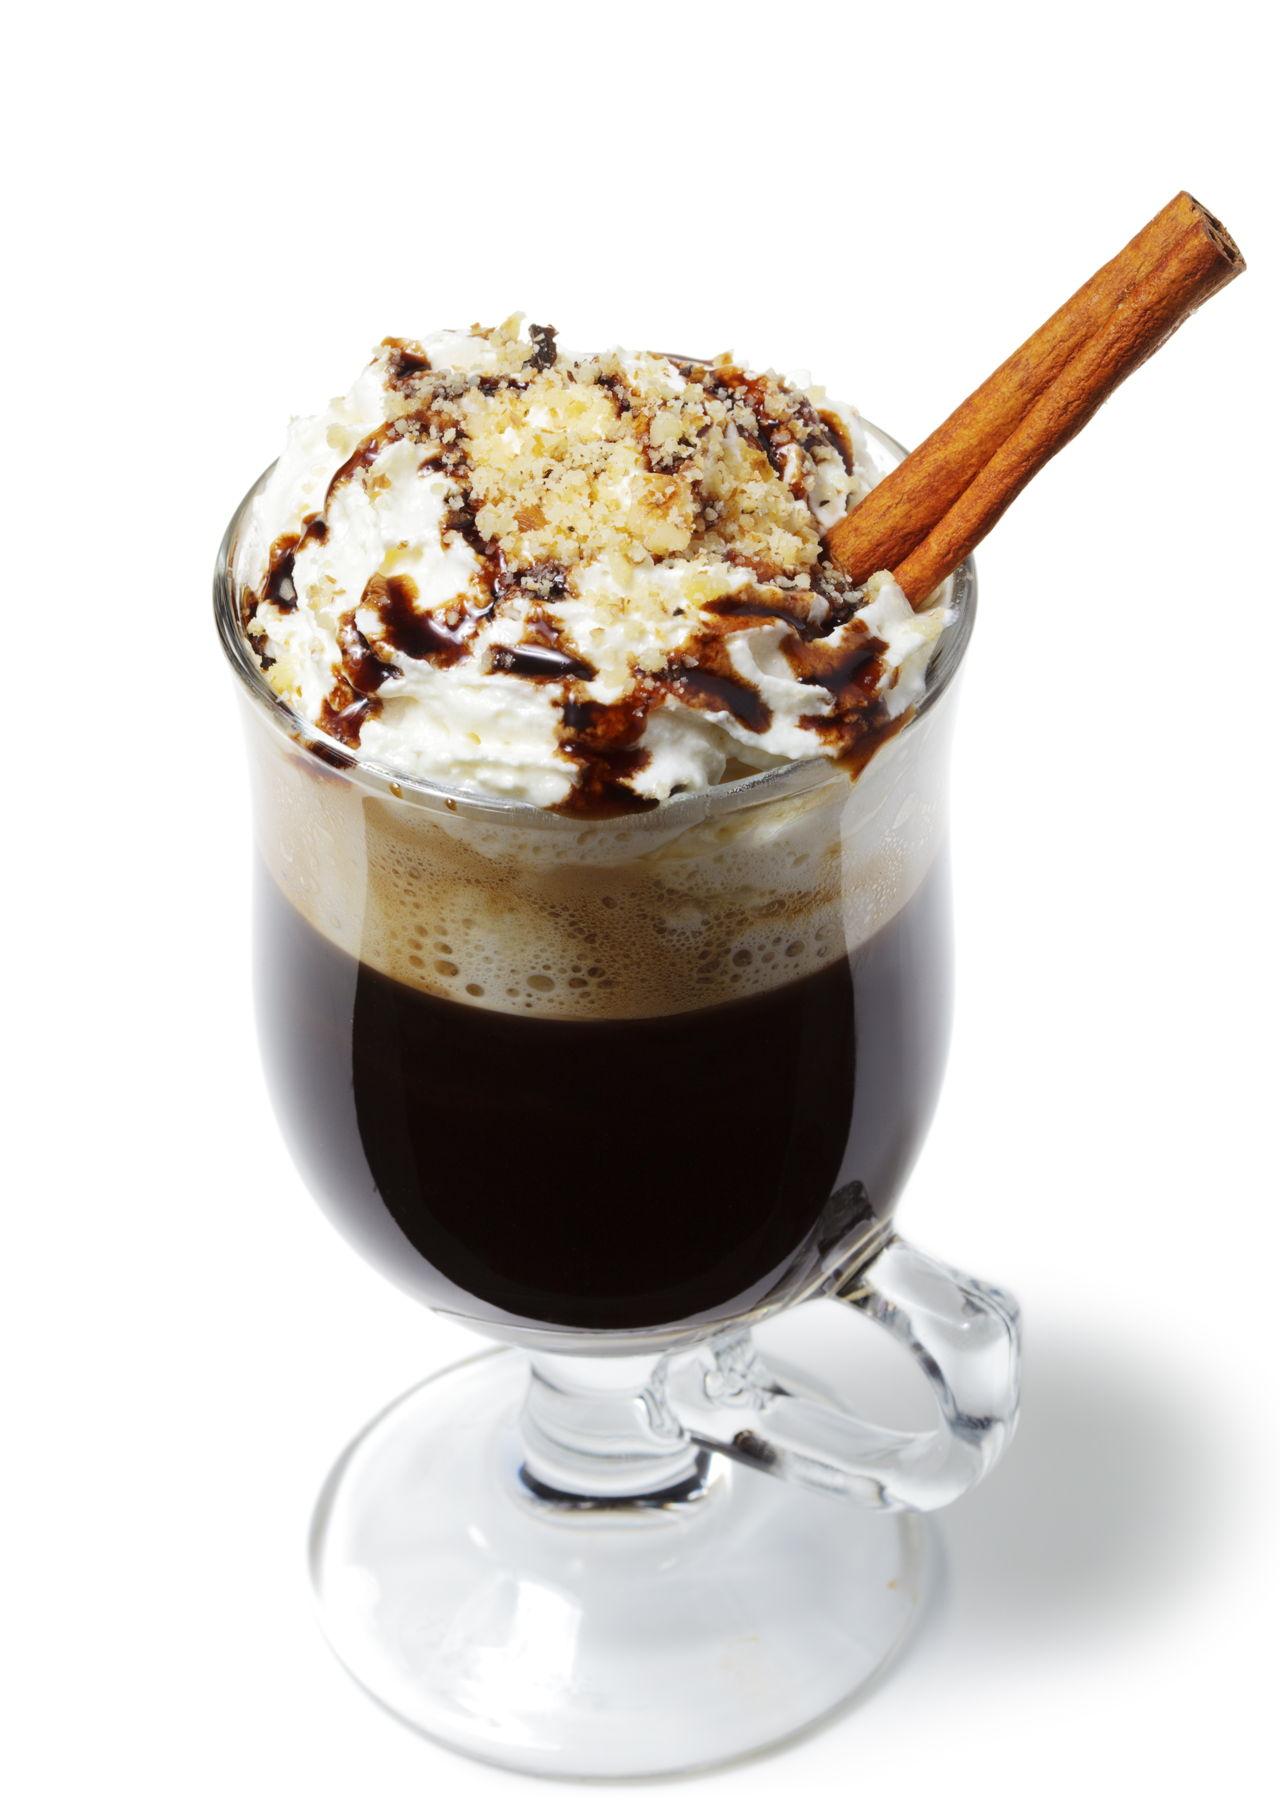 Turn Cold Chocolate Milk Into Hot Chocolate